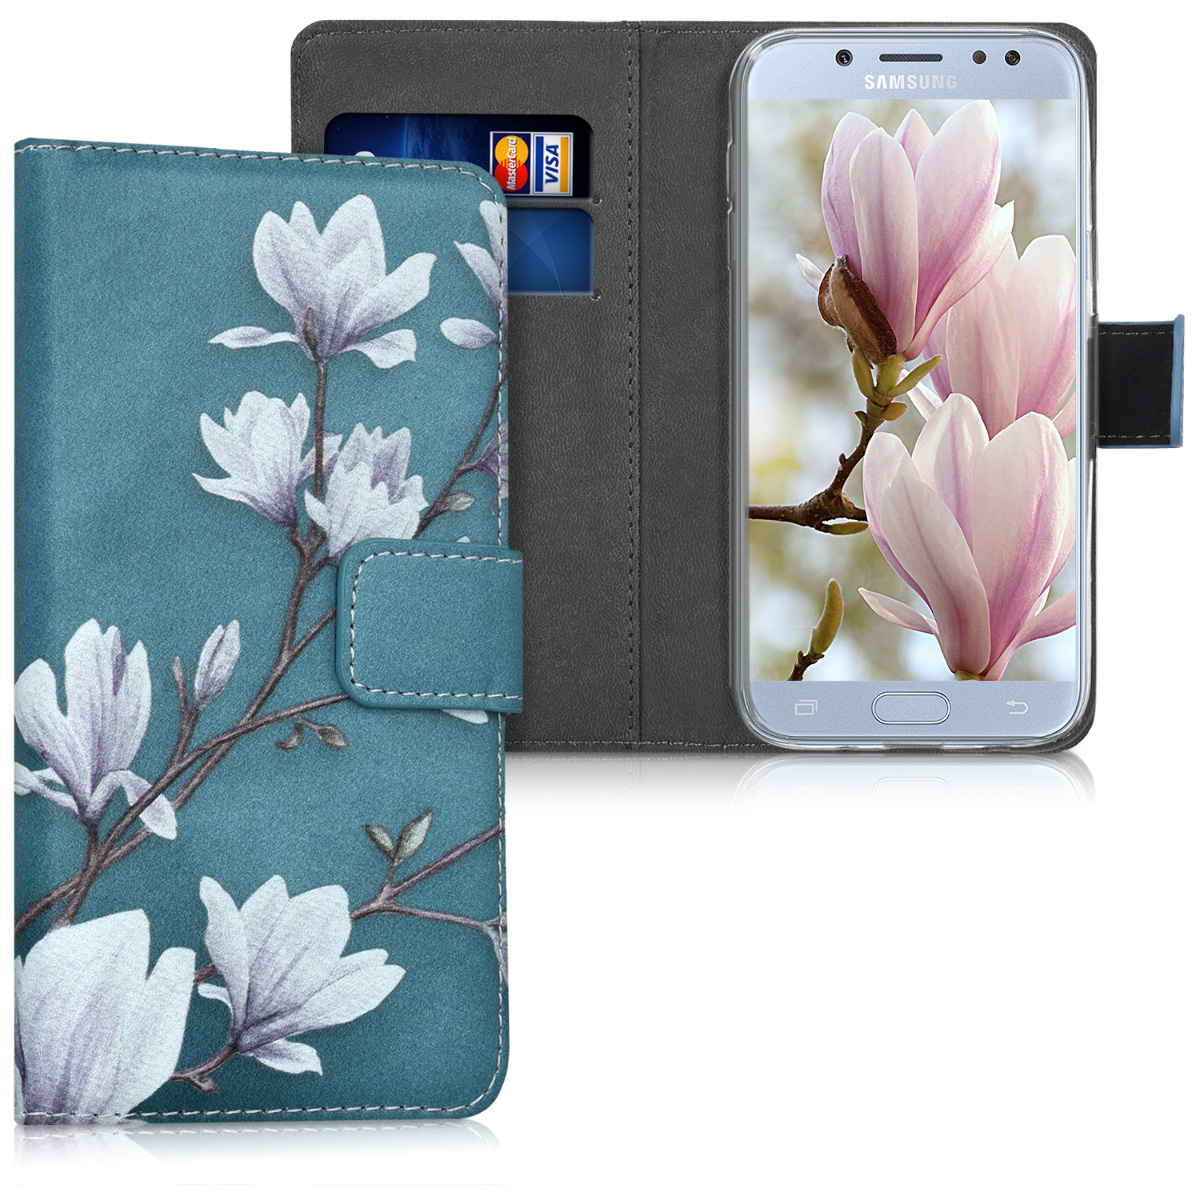 KW Θήκη Πορτοφόλι Samsung Galaxy J5 (2017) DUOS - Taupe / White / Blue Grey (41163.05)